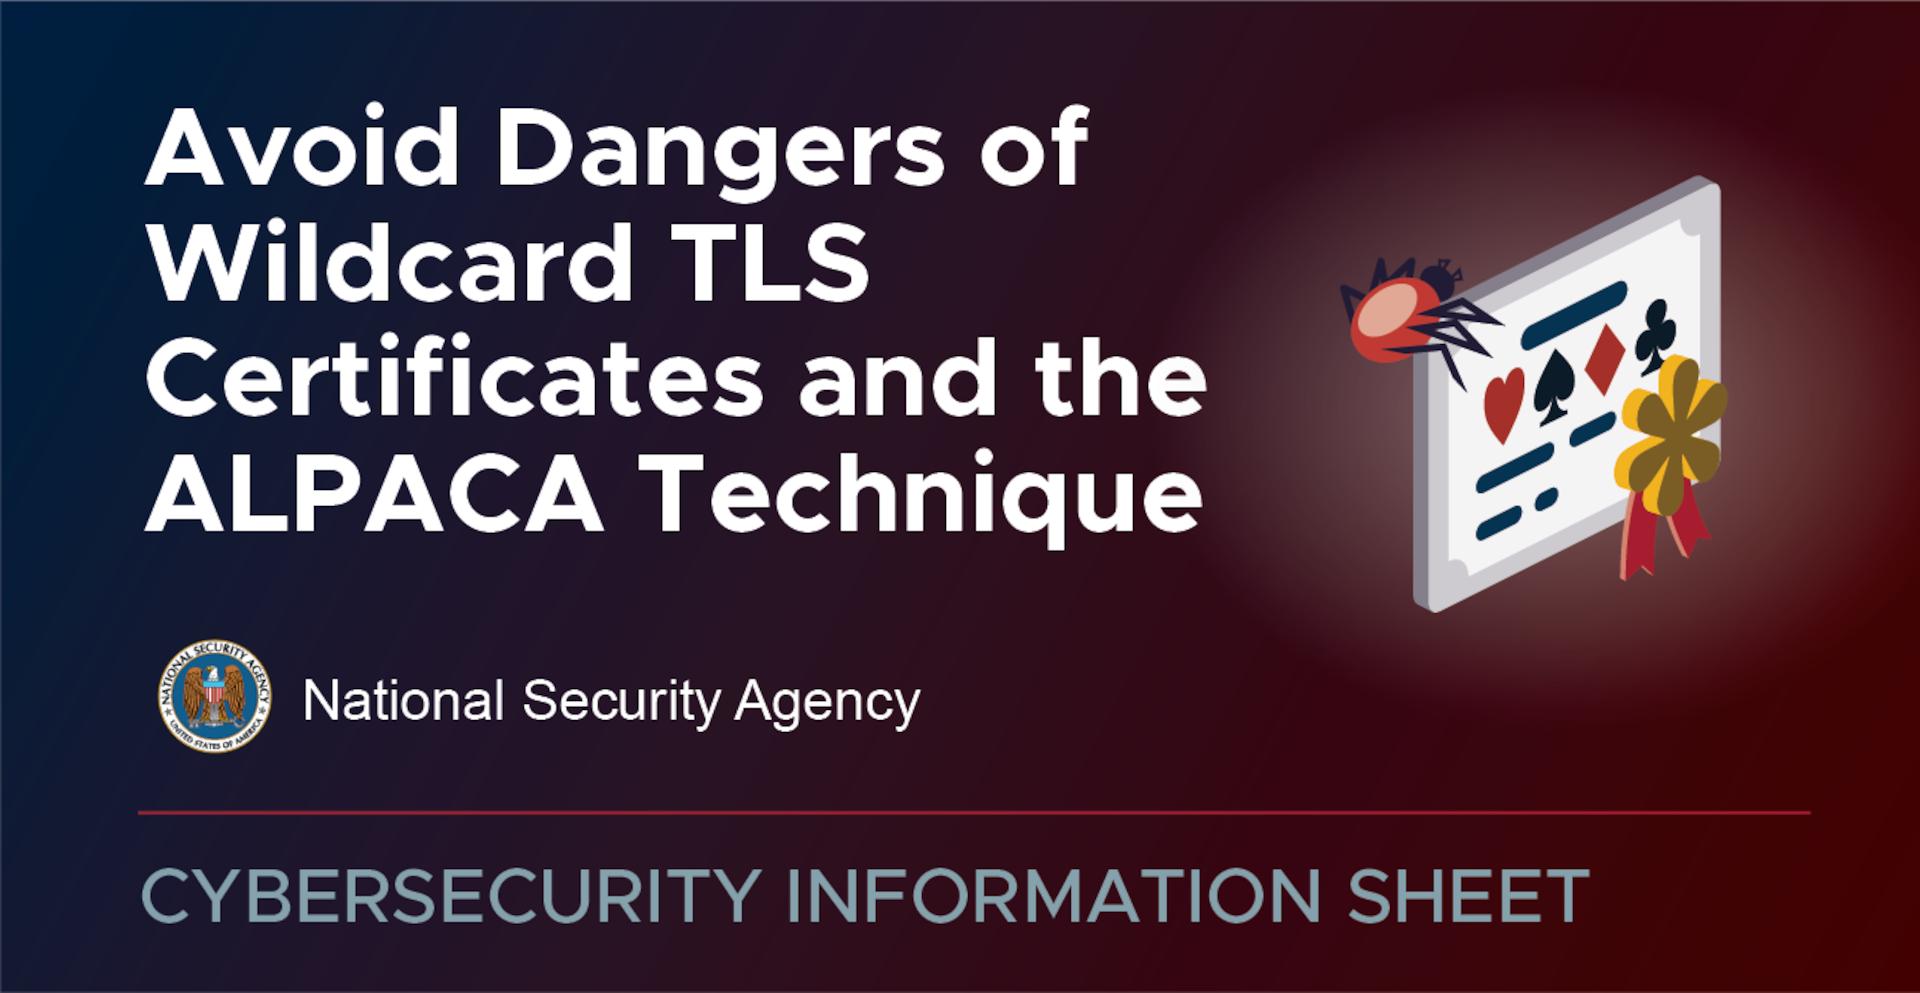 Avoid Dangers of Wildcard TLS Certificates and the ALPACA weakness